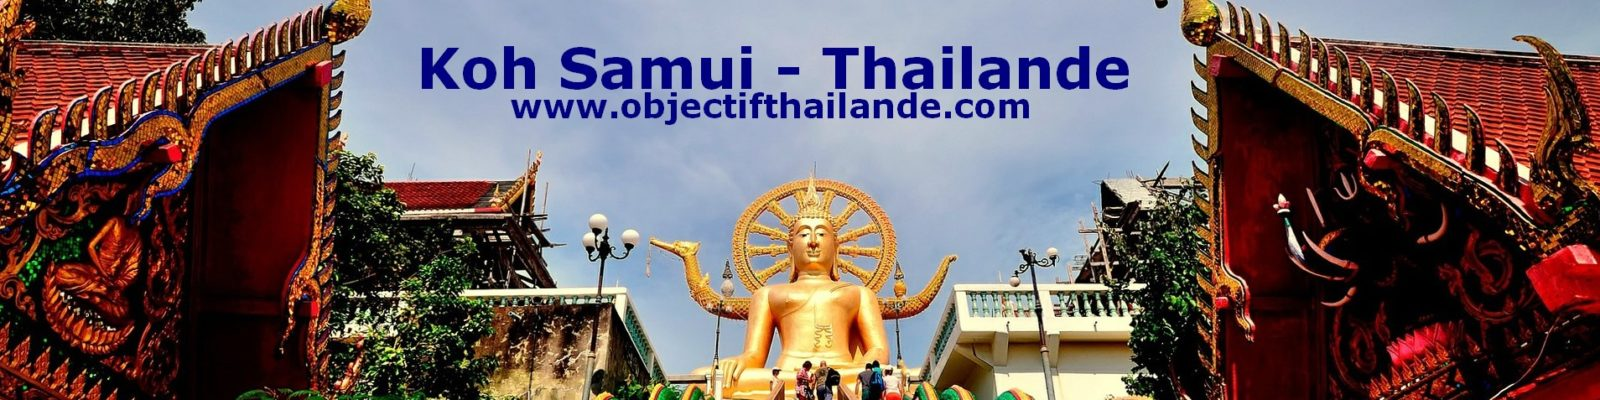 Koh Samui - Thaïlande